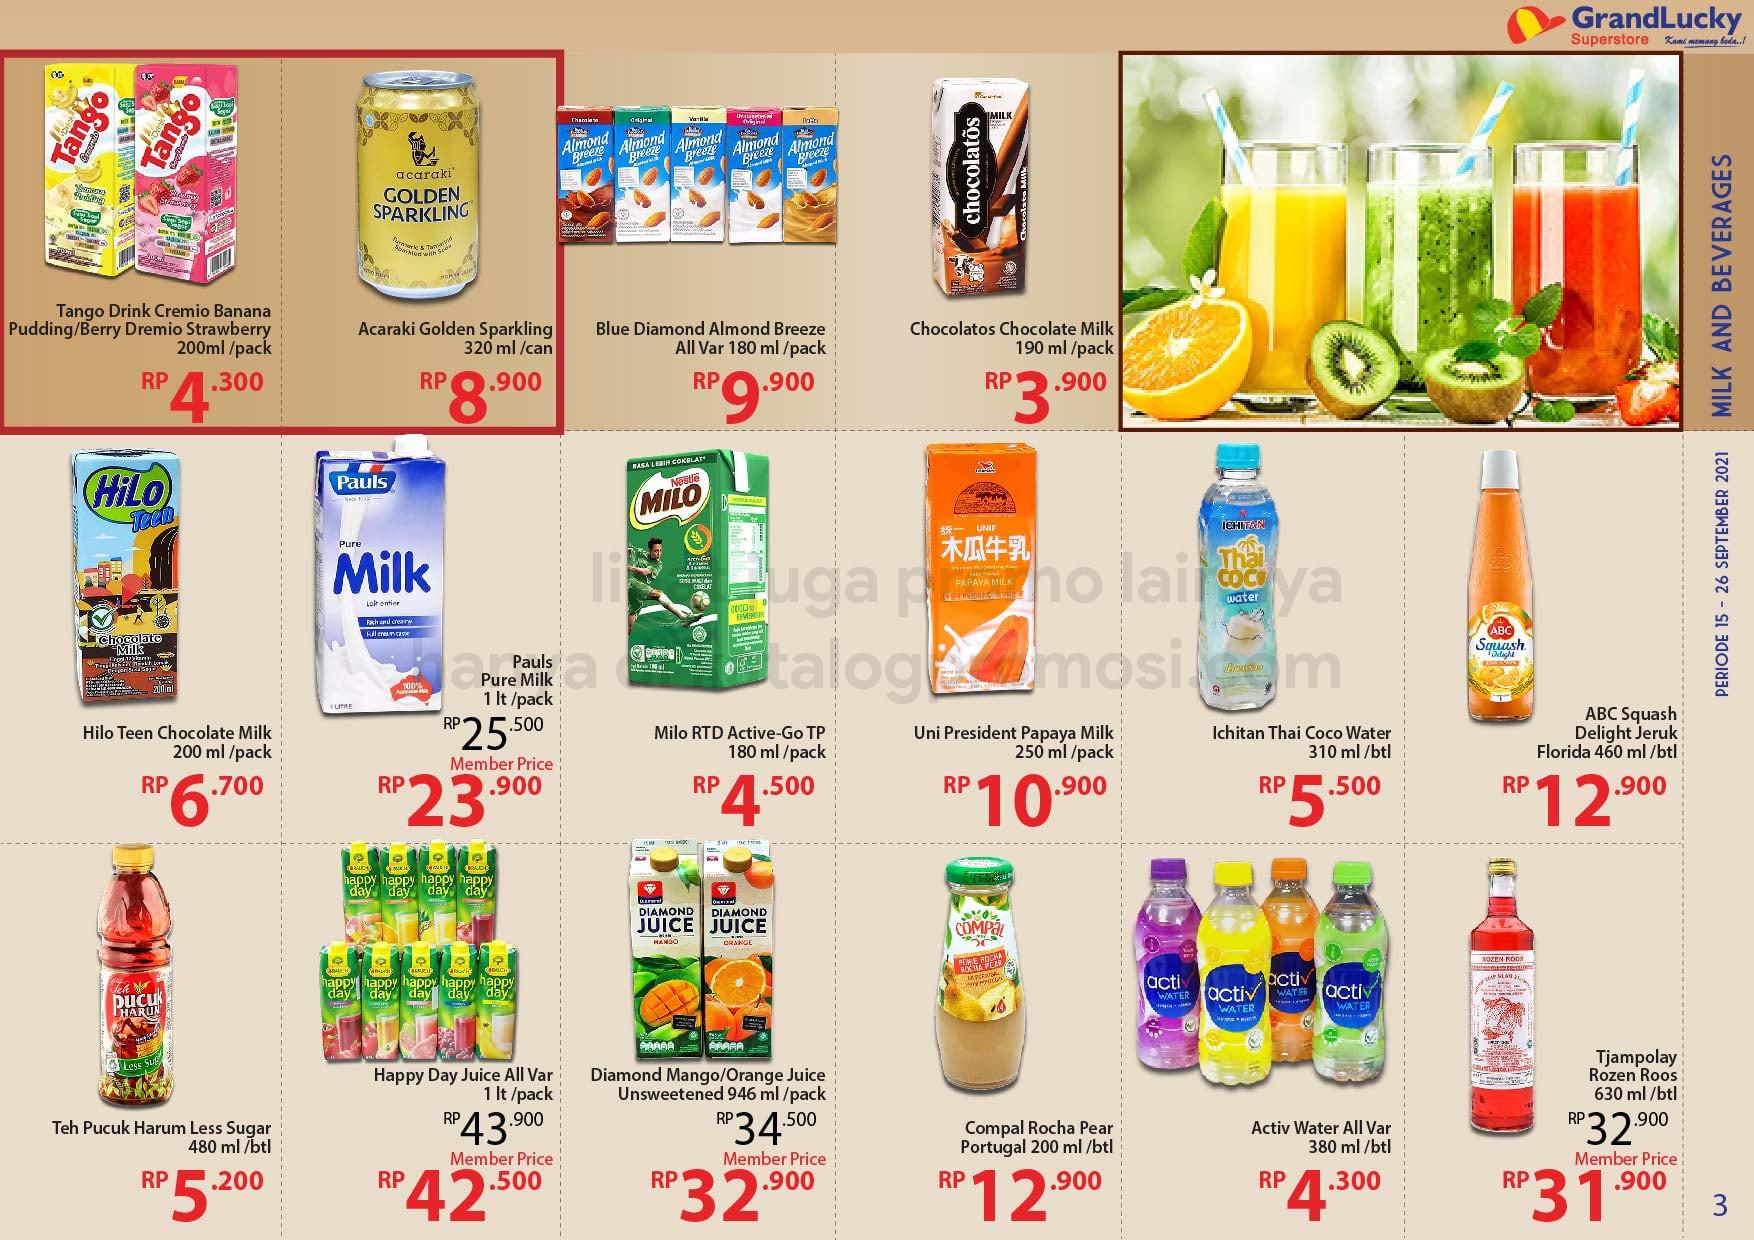 Promo GRAND LUCKY Superstore Katalog Mingguan Periode 15-26 September 2021